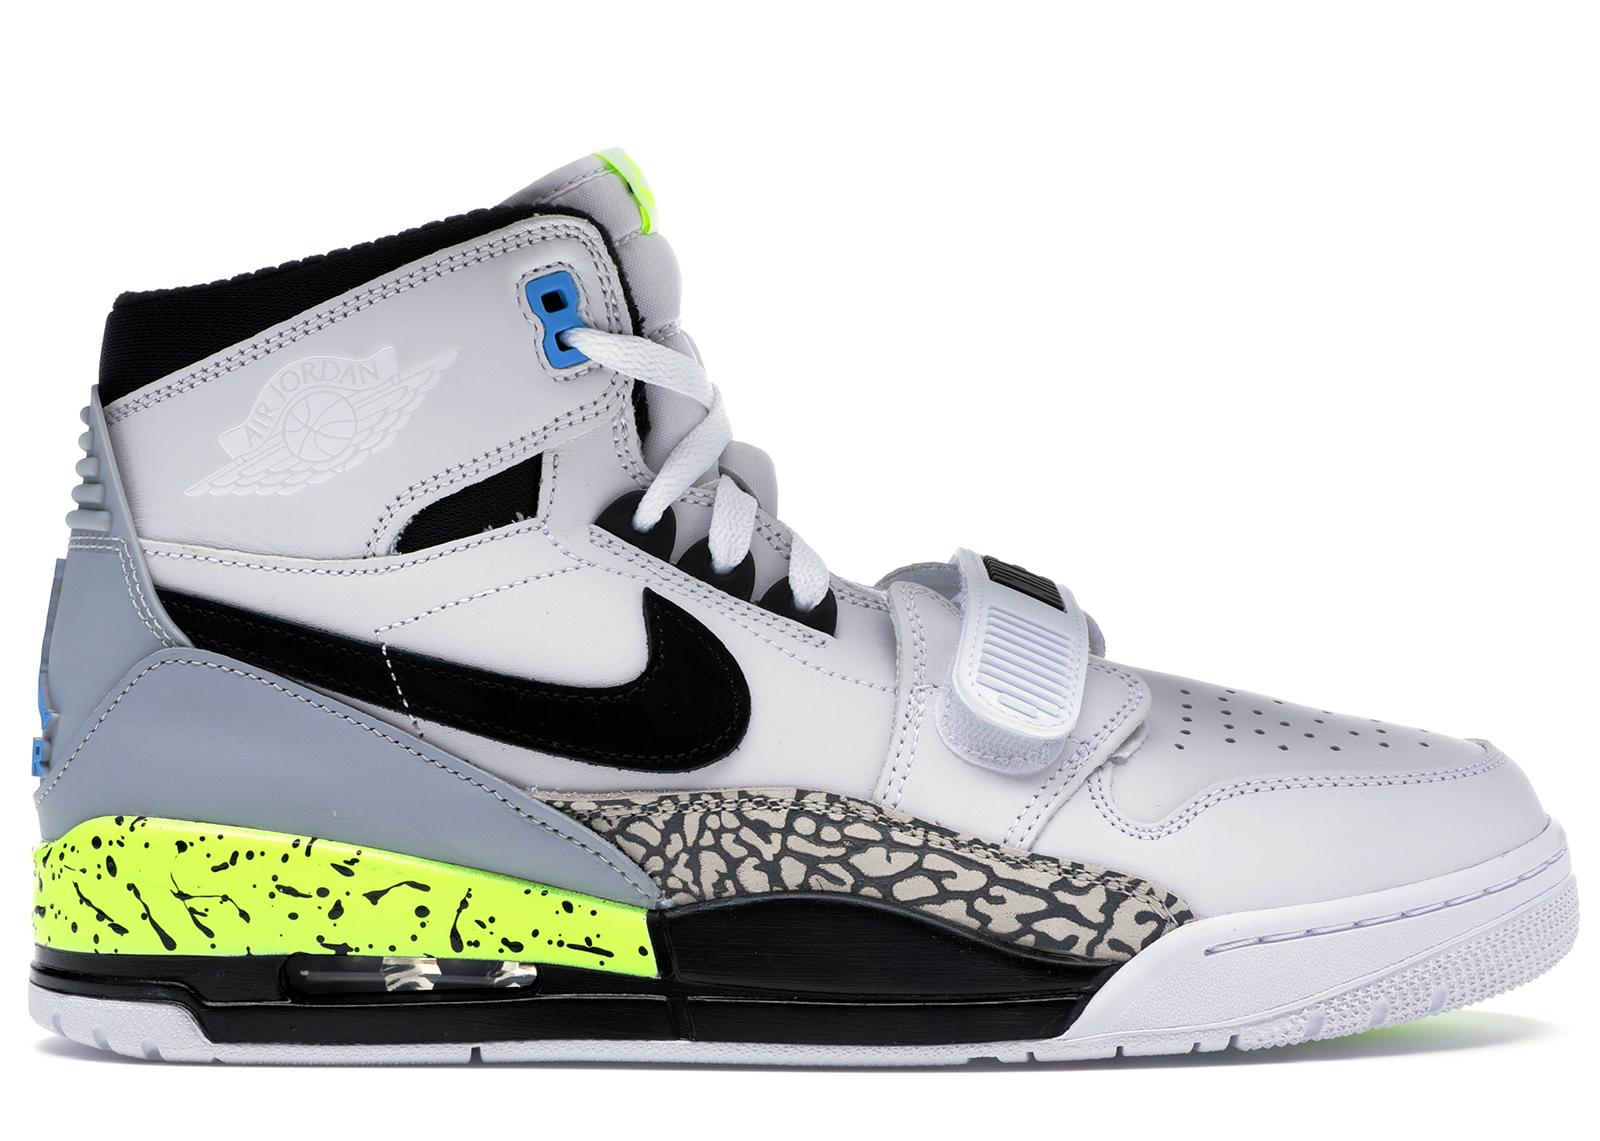 Nike Air Jordan Legacy 312 NRG SZ 11 Just Don C Billy Hoyle Volt AQ4160-107